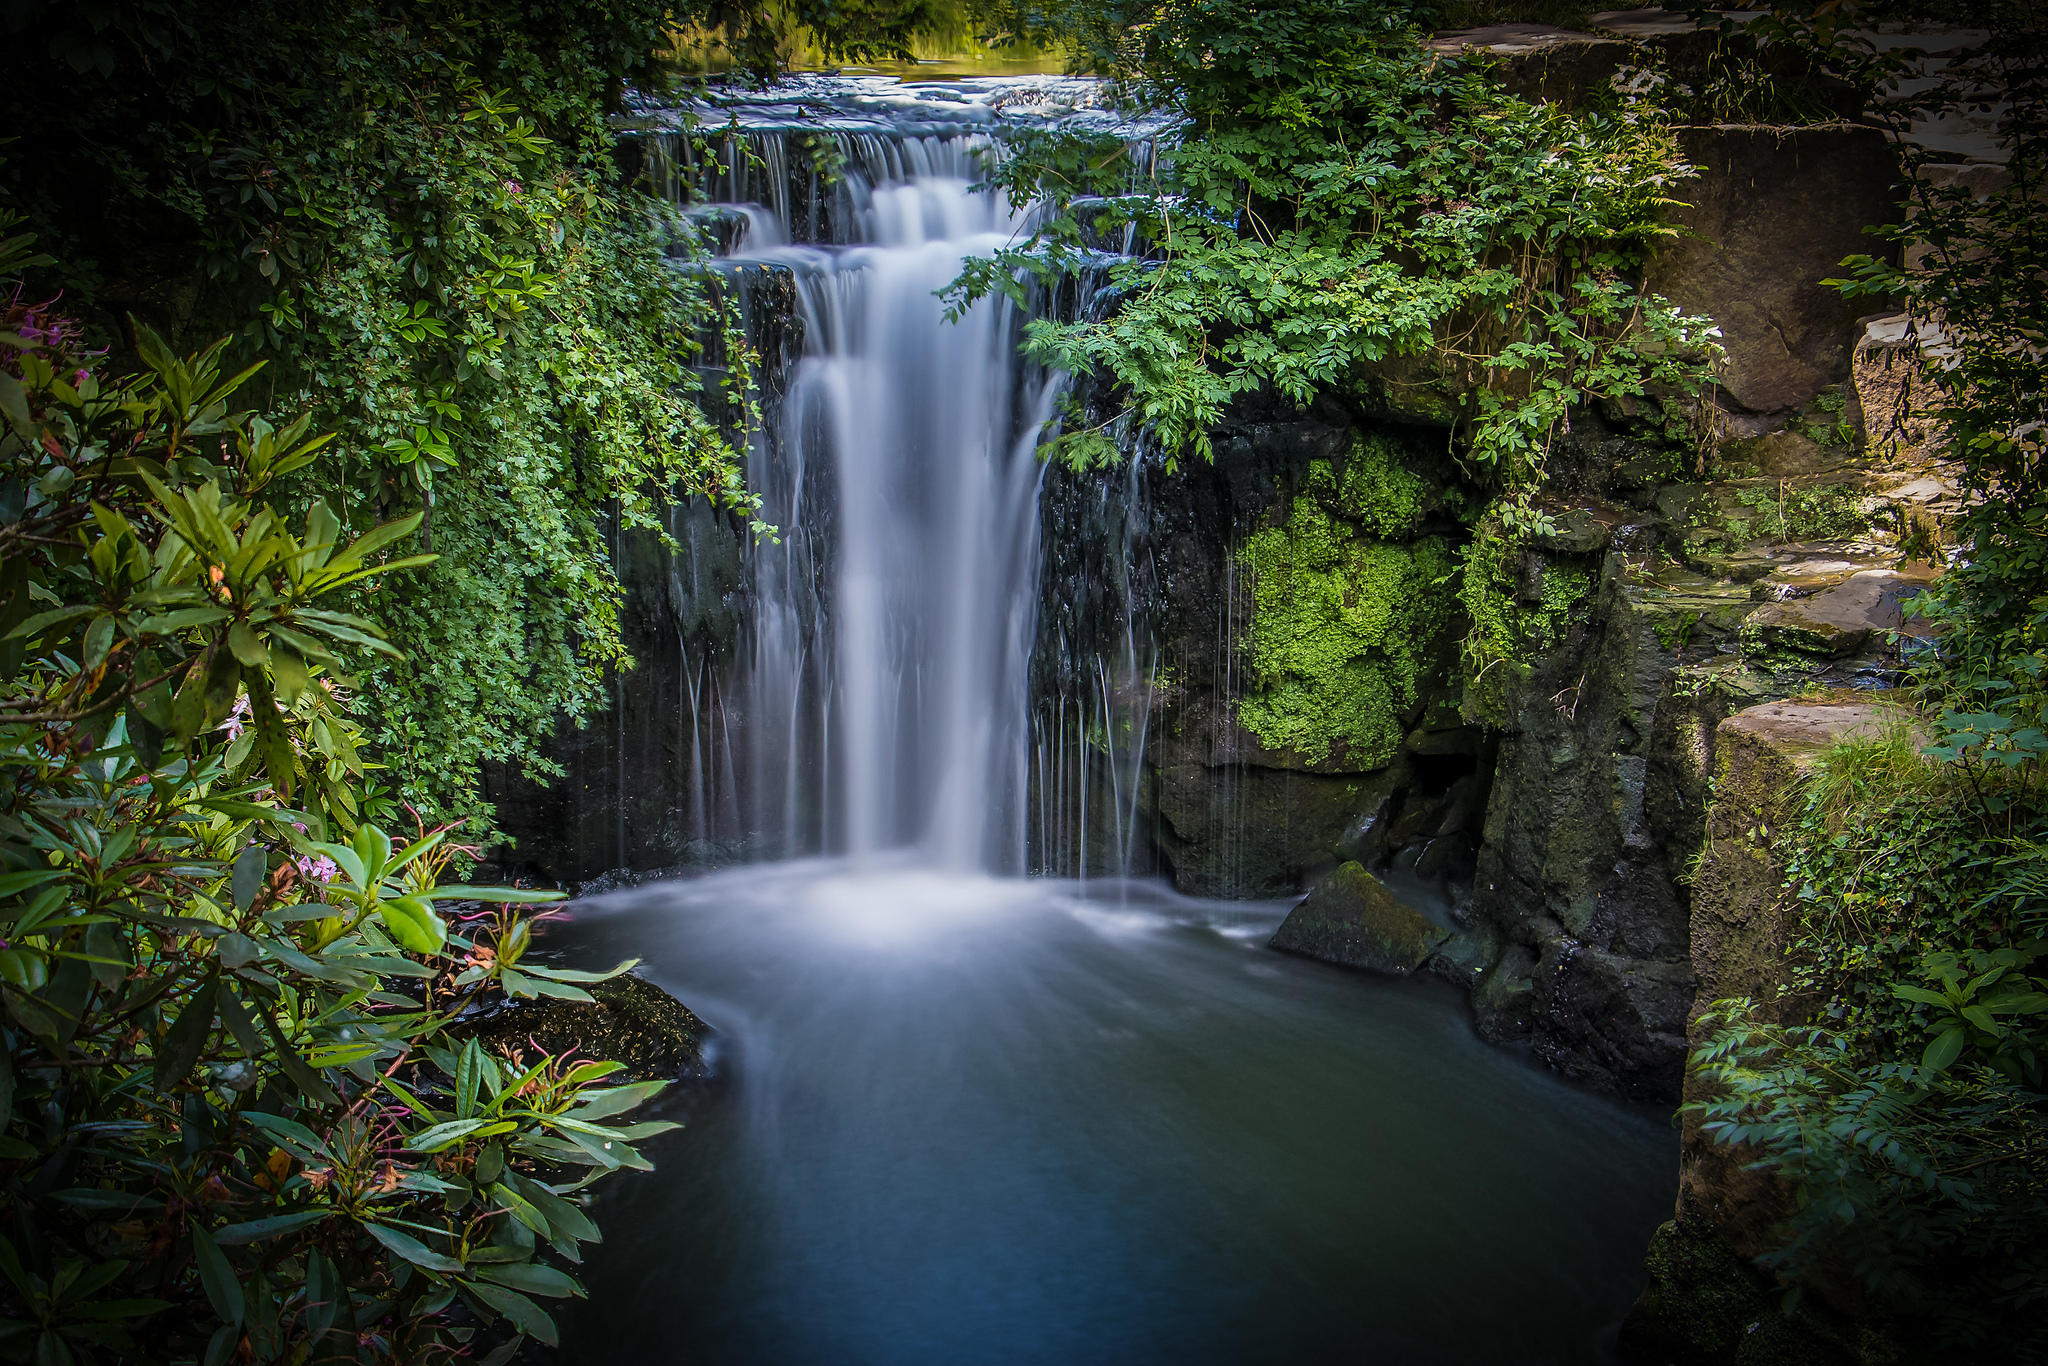 водопад, Jesmond Dene Park, Ньюкасл-апон-Тайн